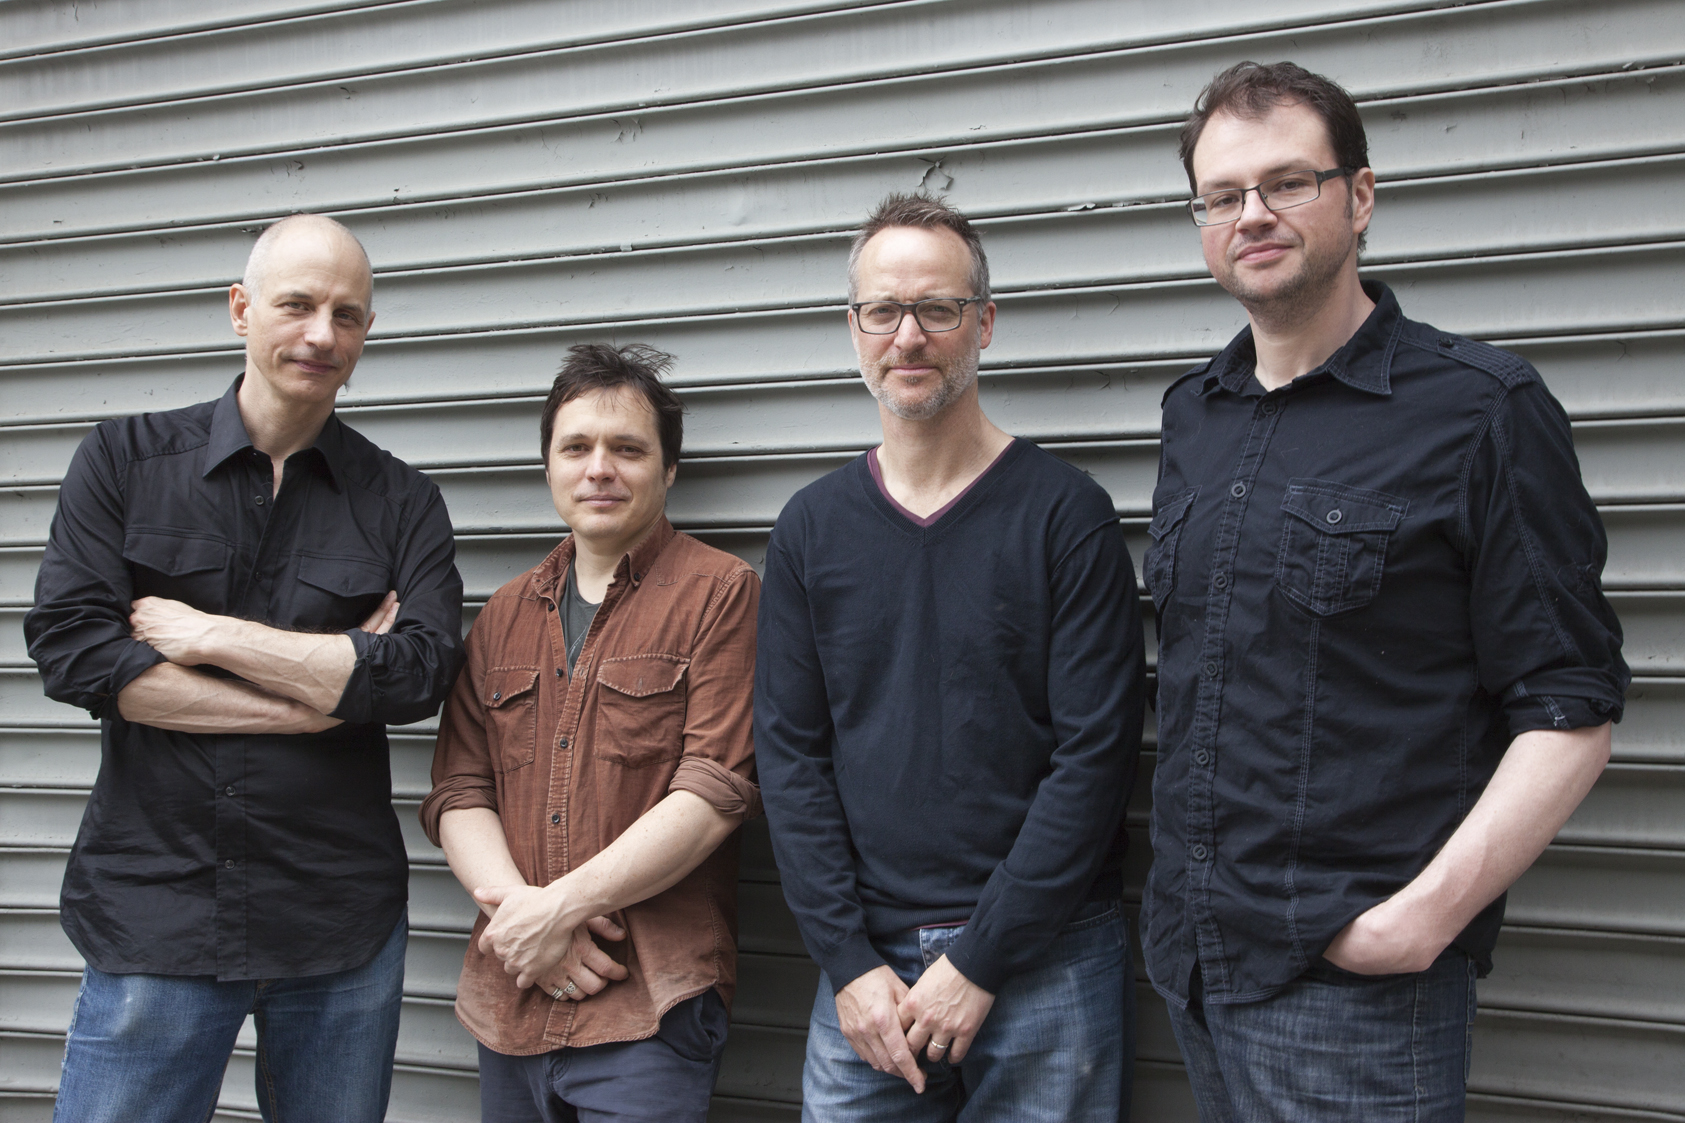 Bonebridge - Erik Friedlander, Trevor Dunn, Michael Sarin, Doug Wamble